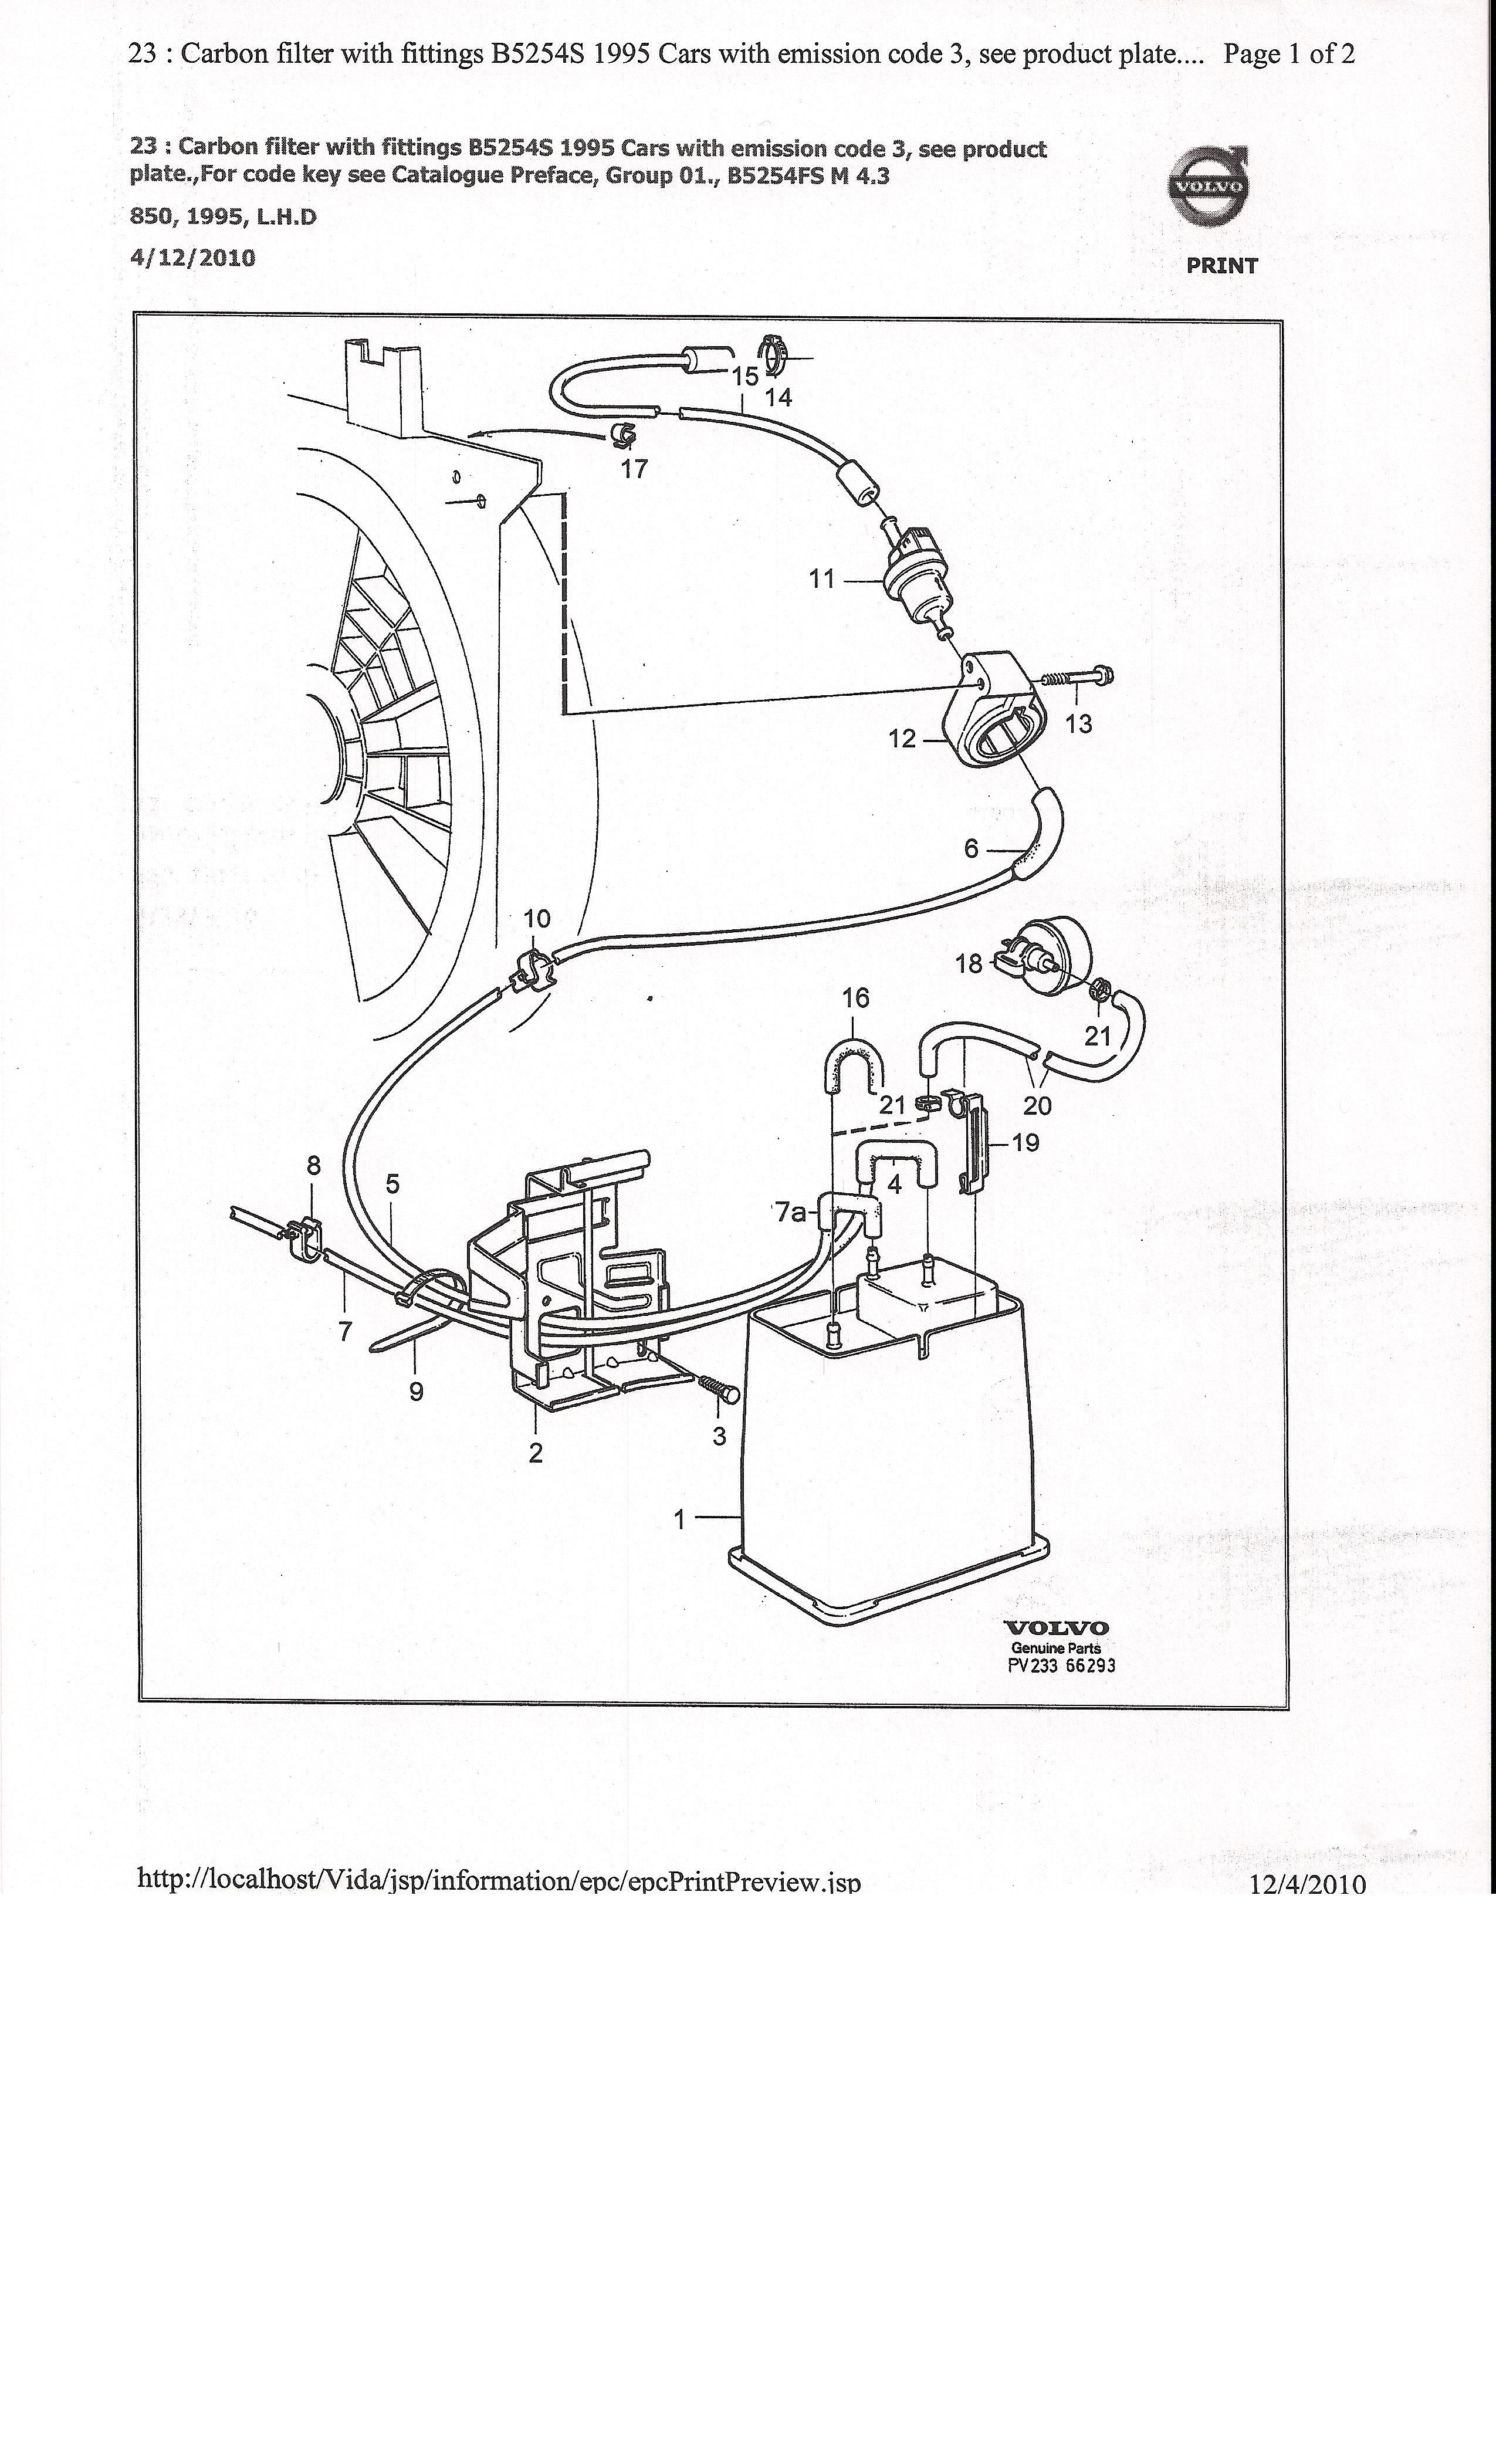 evap 850 non turbo jpg